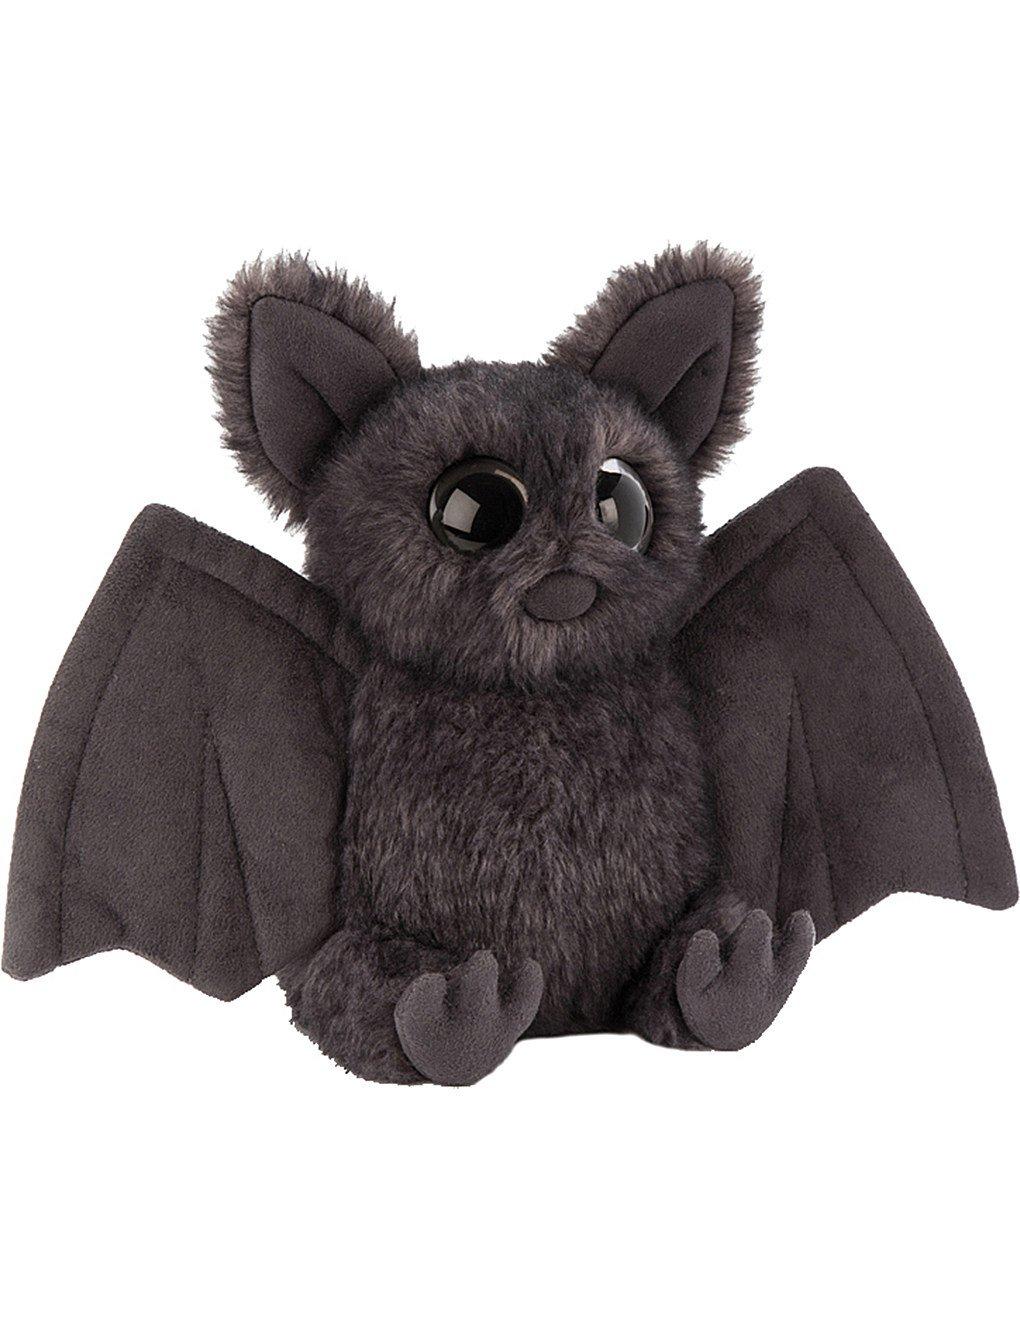 Bat stuffed animal